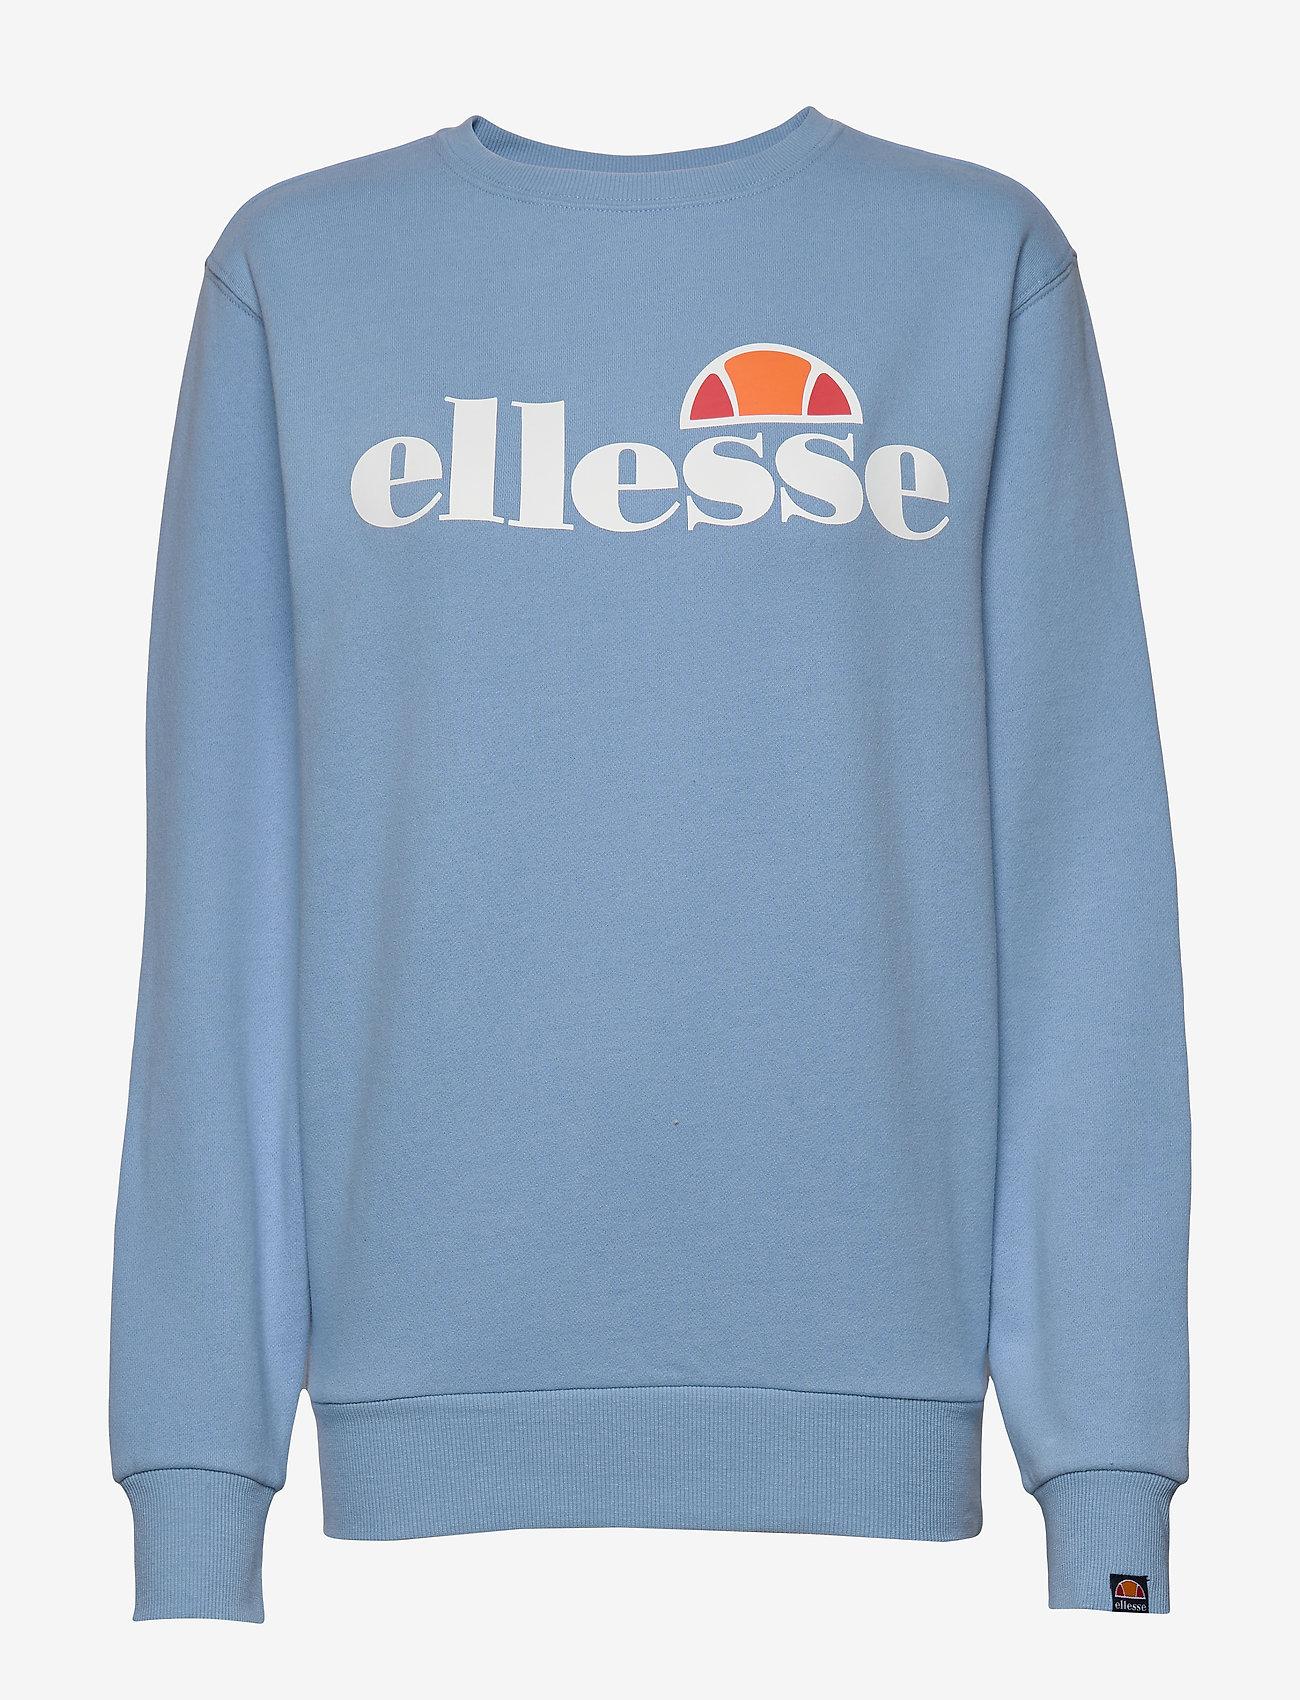 Ellesse - EL AGATA SWEATSHIRT - bluzy - light blue - 1